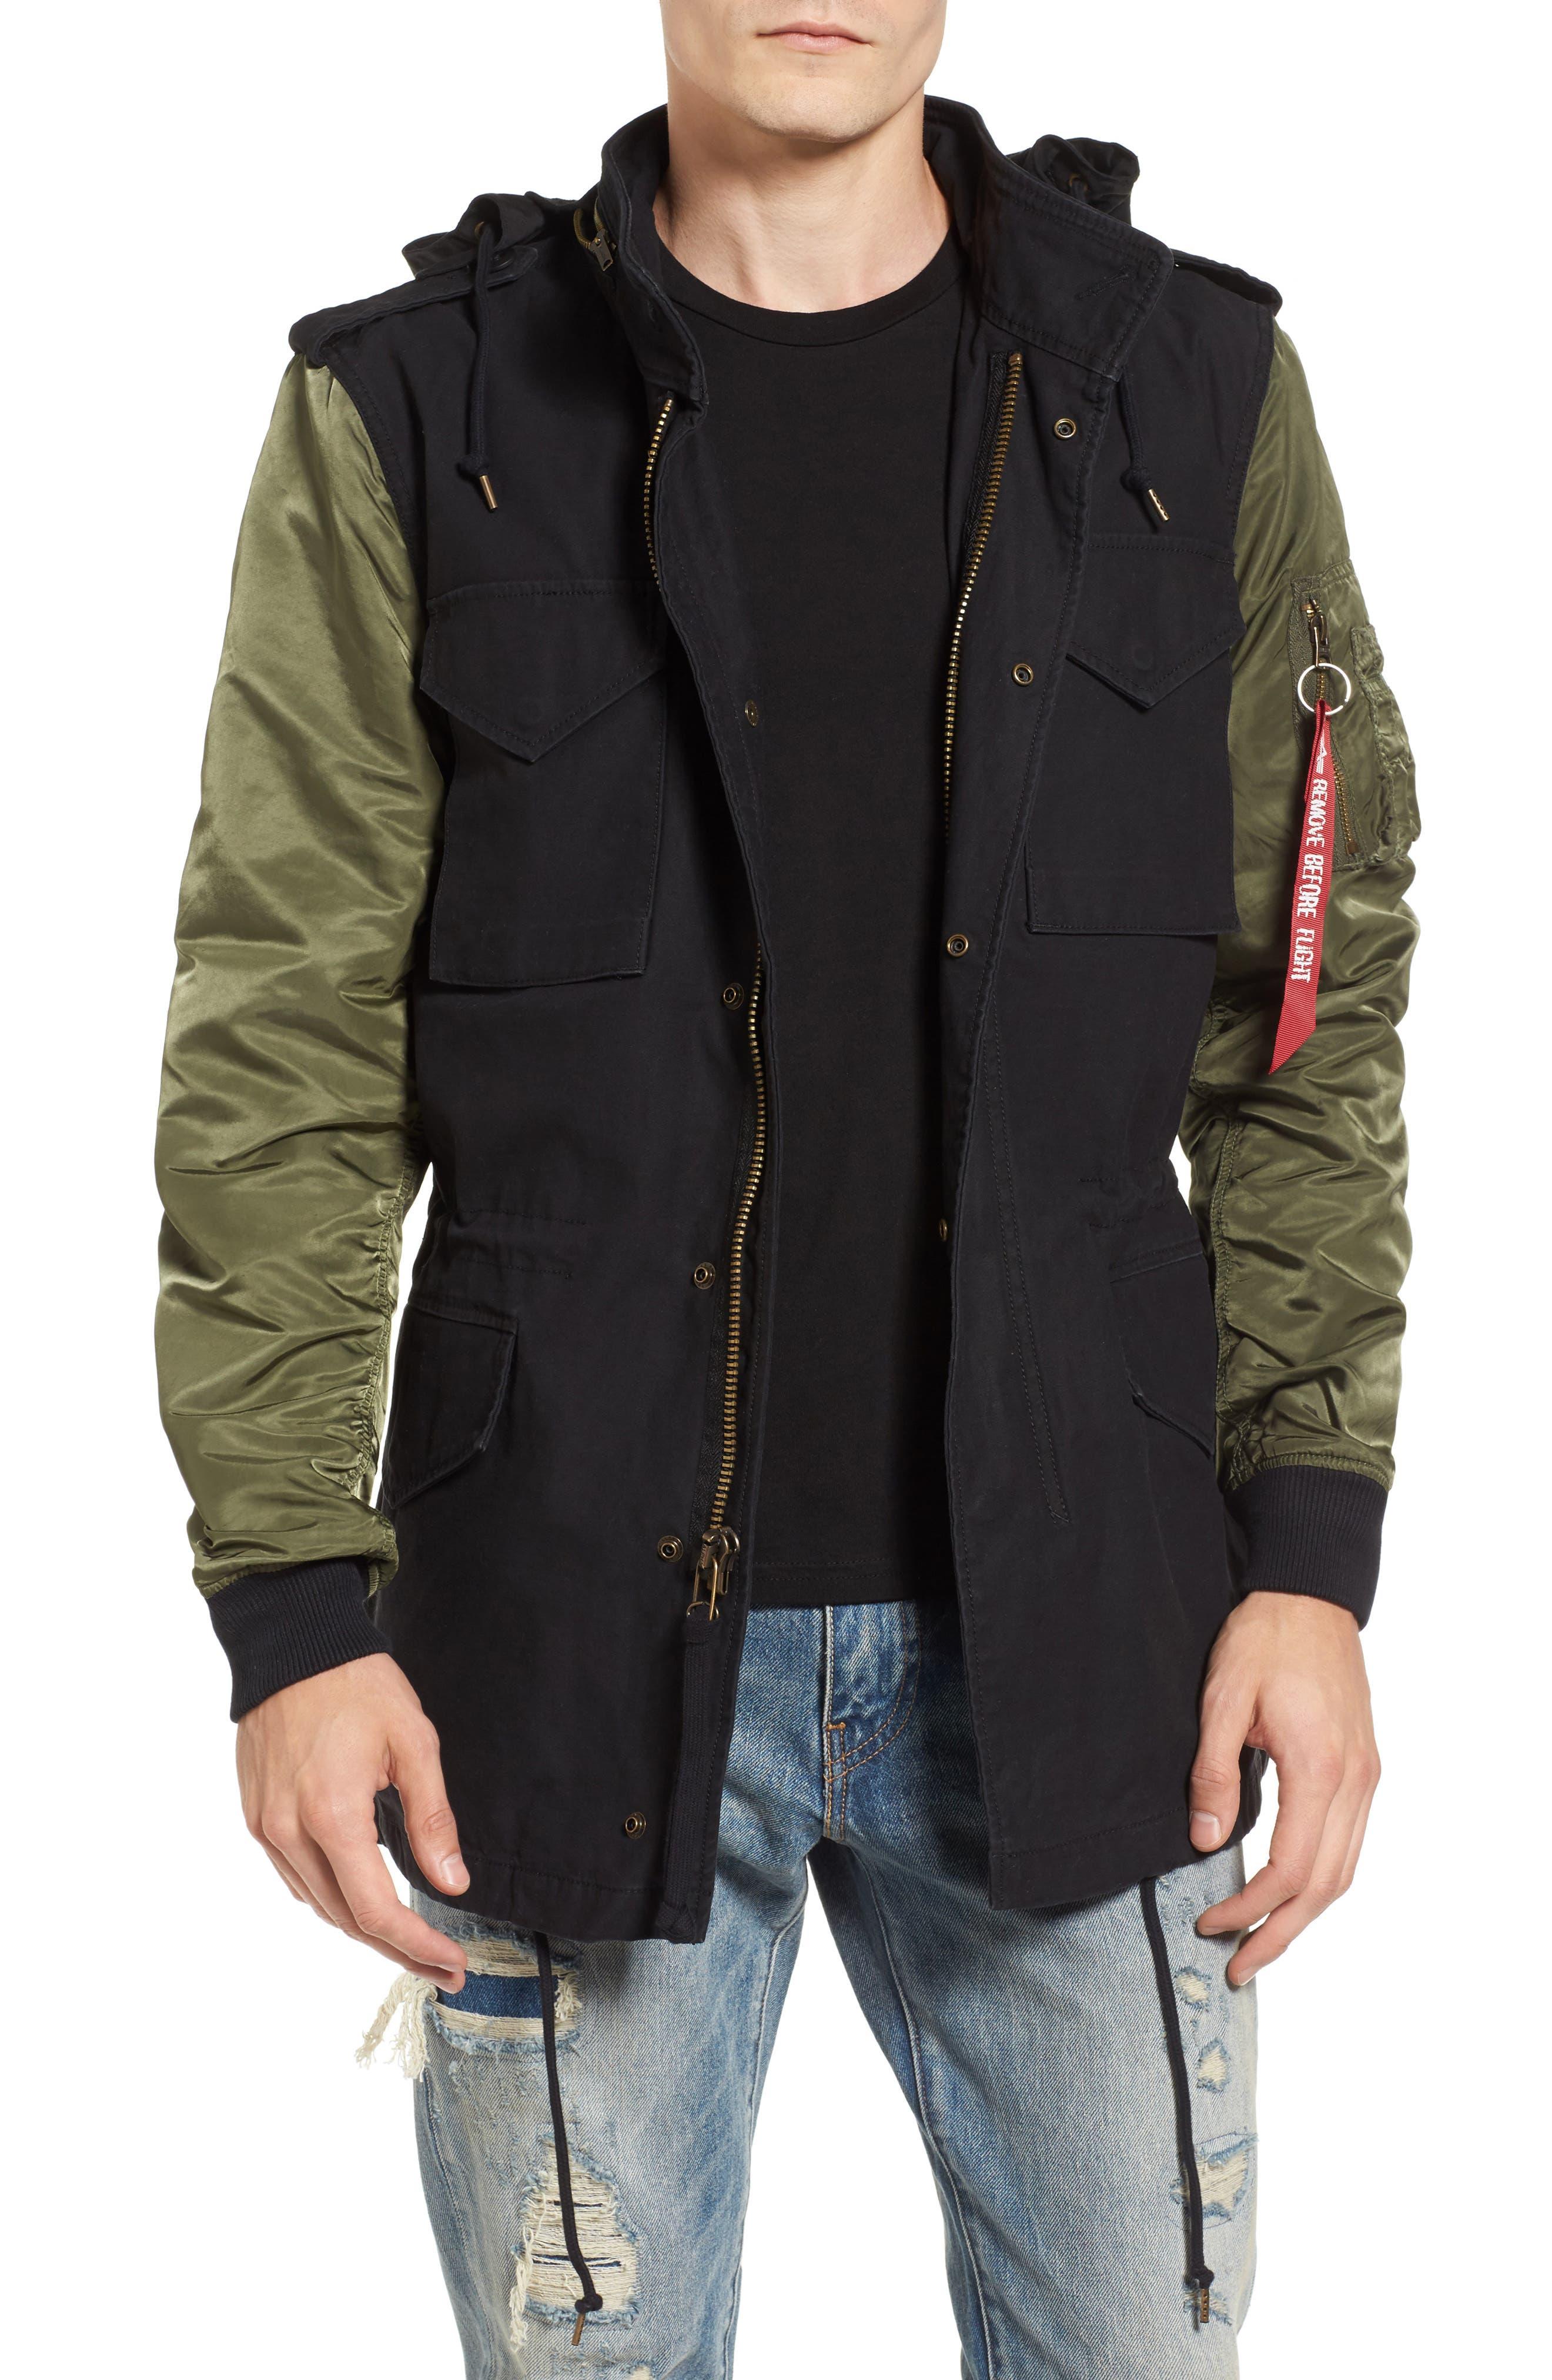 Fusion Field Coat,                             Main thumbnail 1, color,                             Black/ Sage